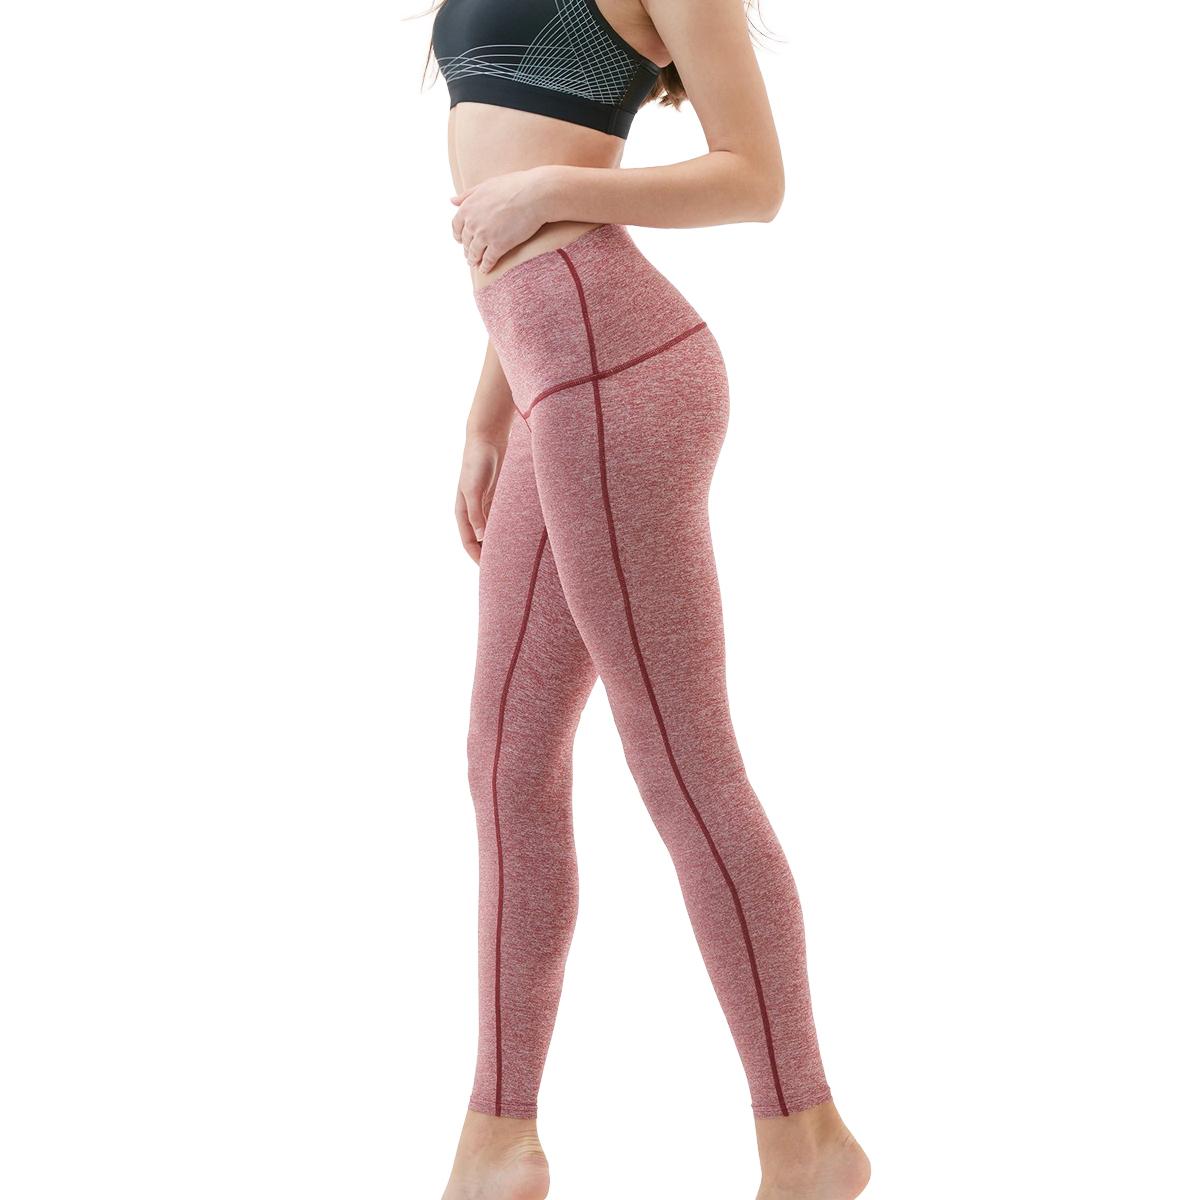 thumbnail 98 - TSLA Tesla FYP42 Women's High-Waisted Ultra-Stretch Tummy Control Yoga Pants